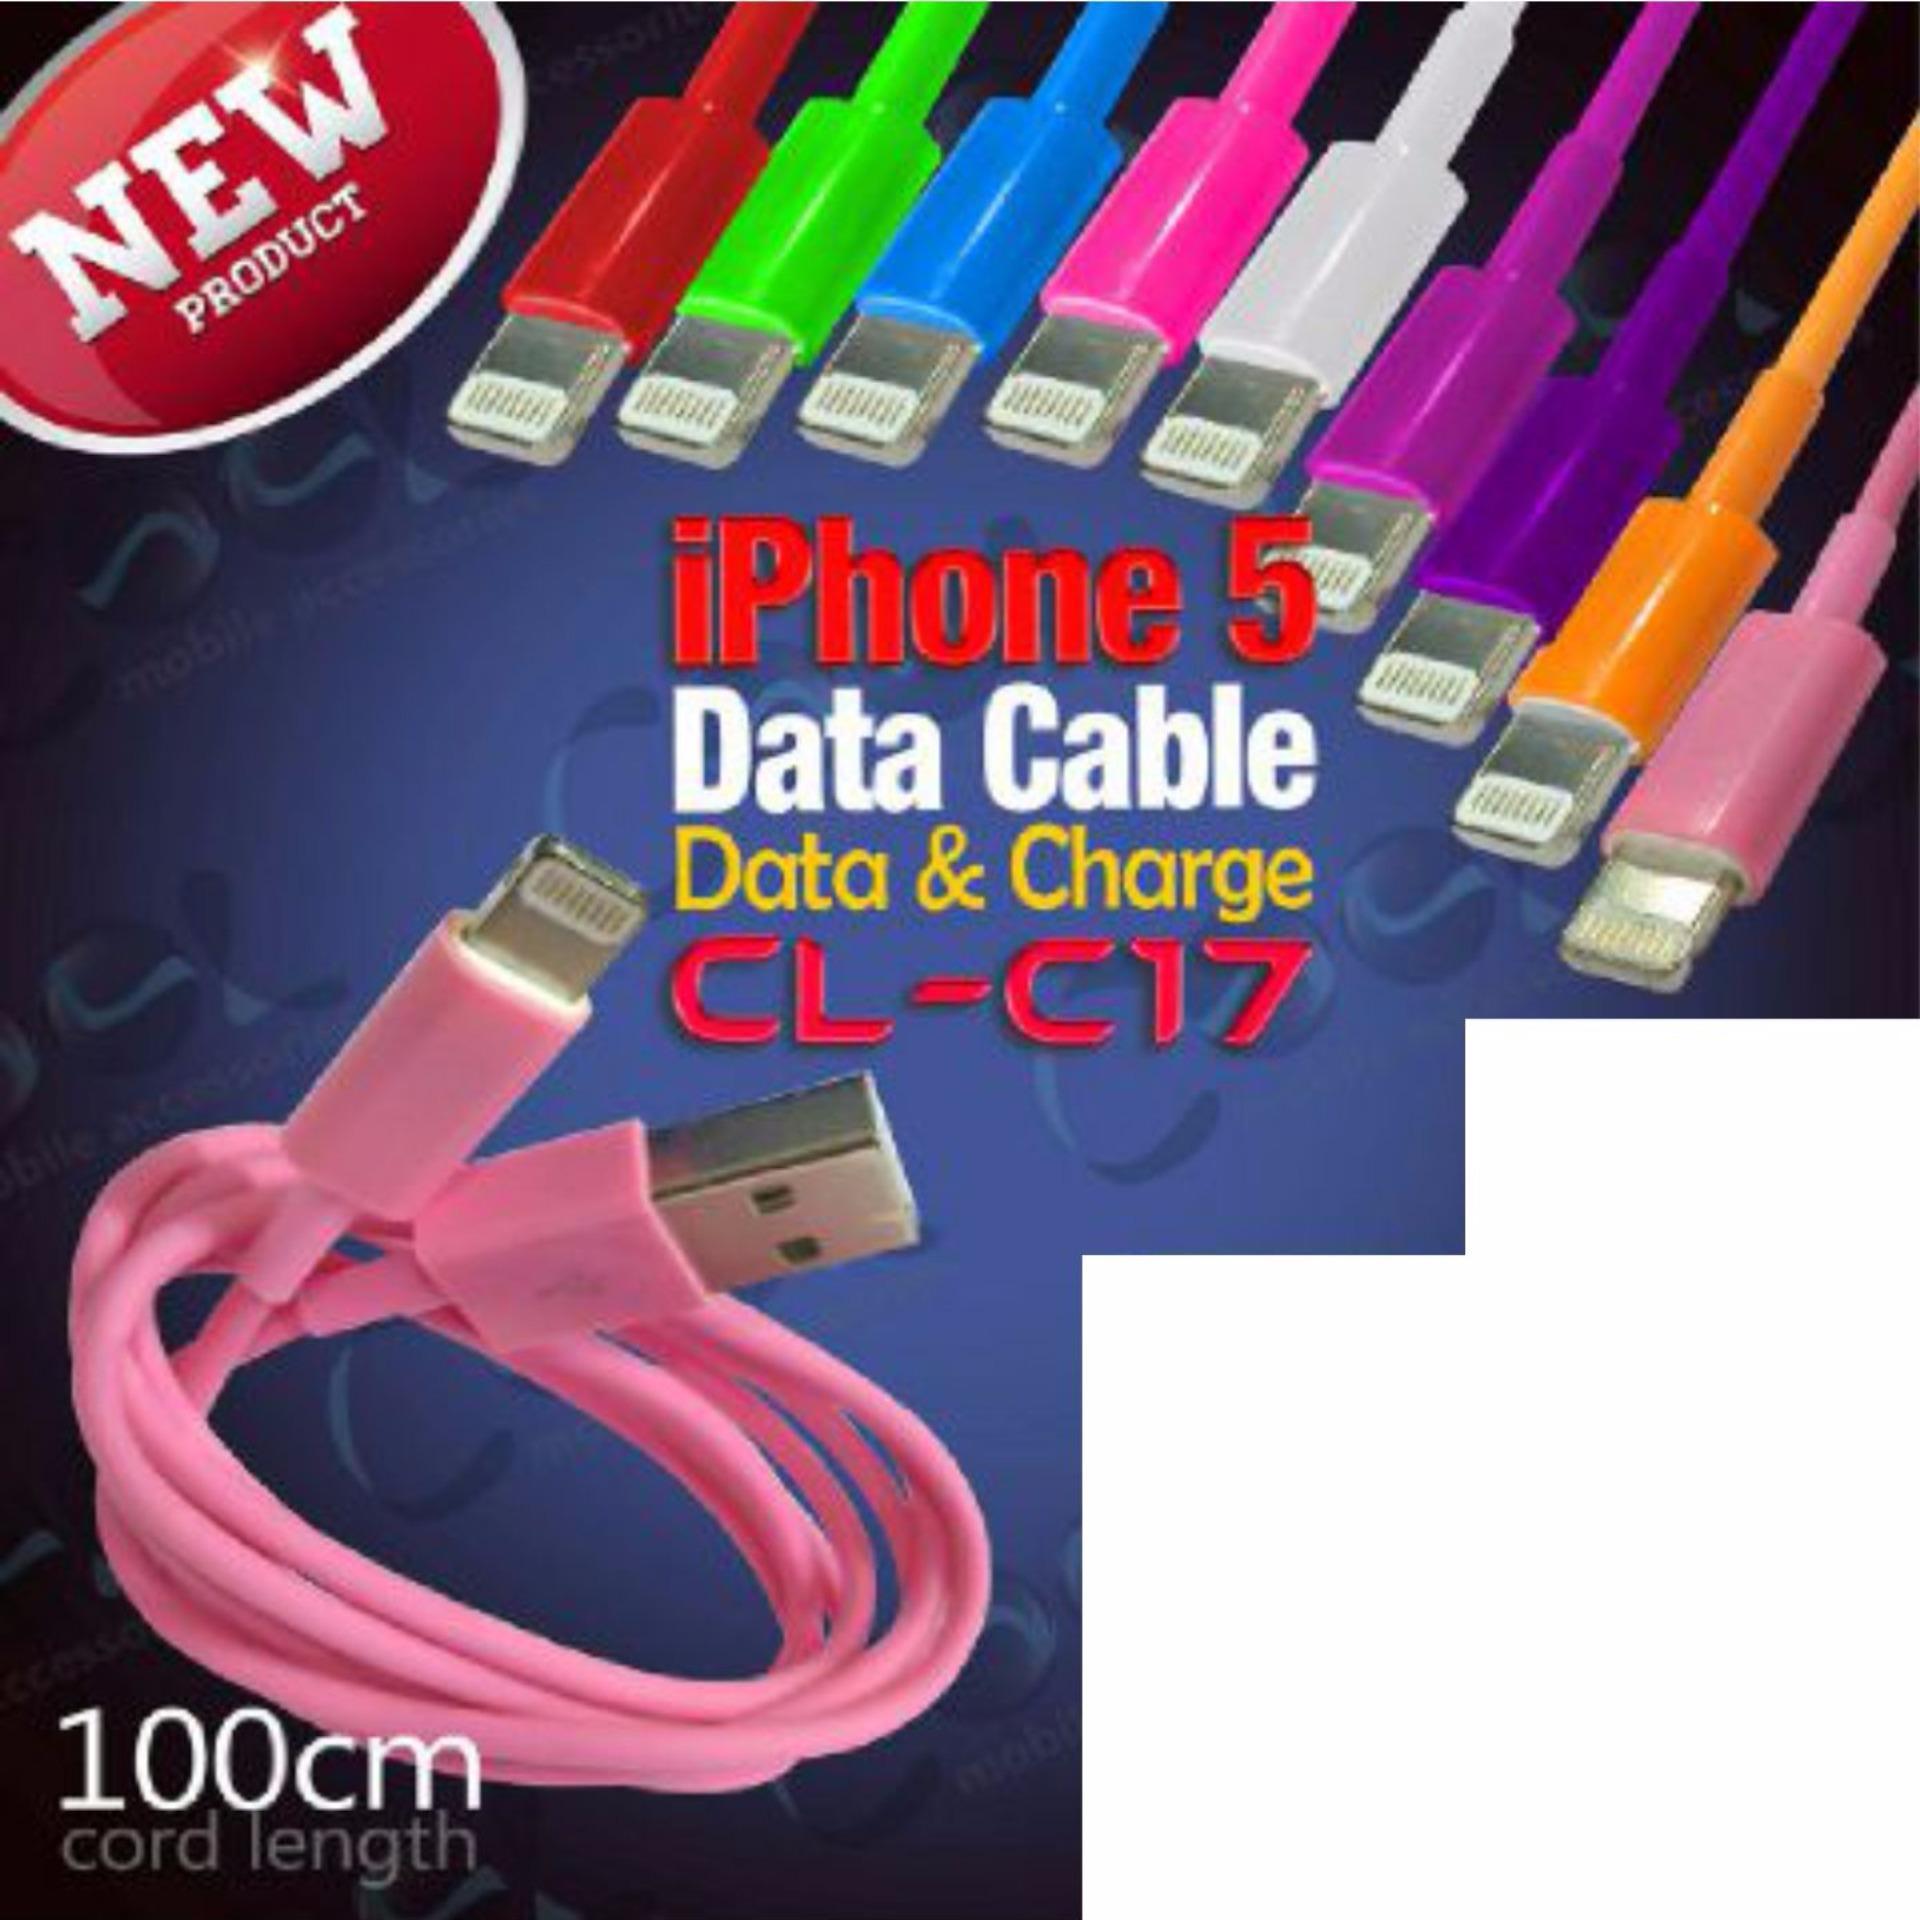 yumoto KABEL DATA LIGHTNING USB CHARGER IPAD IPOD IPHONE 5 5S 6 6Scl-c17